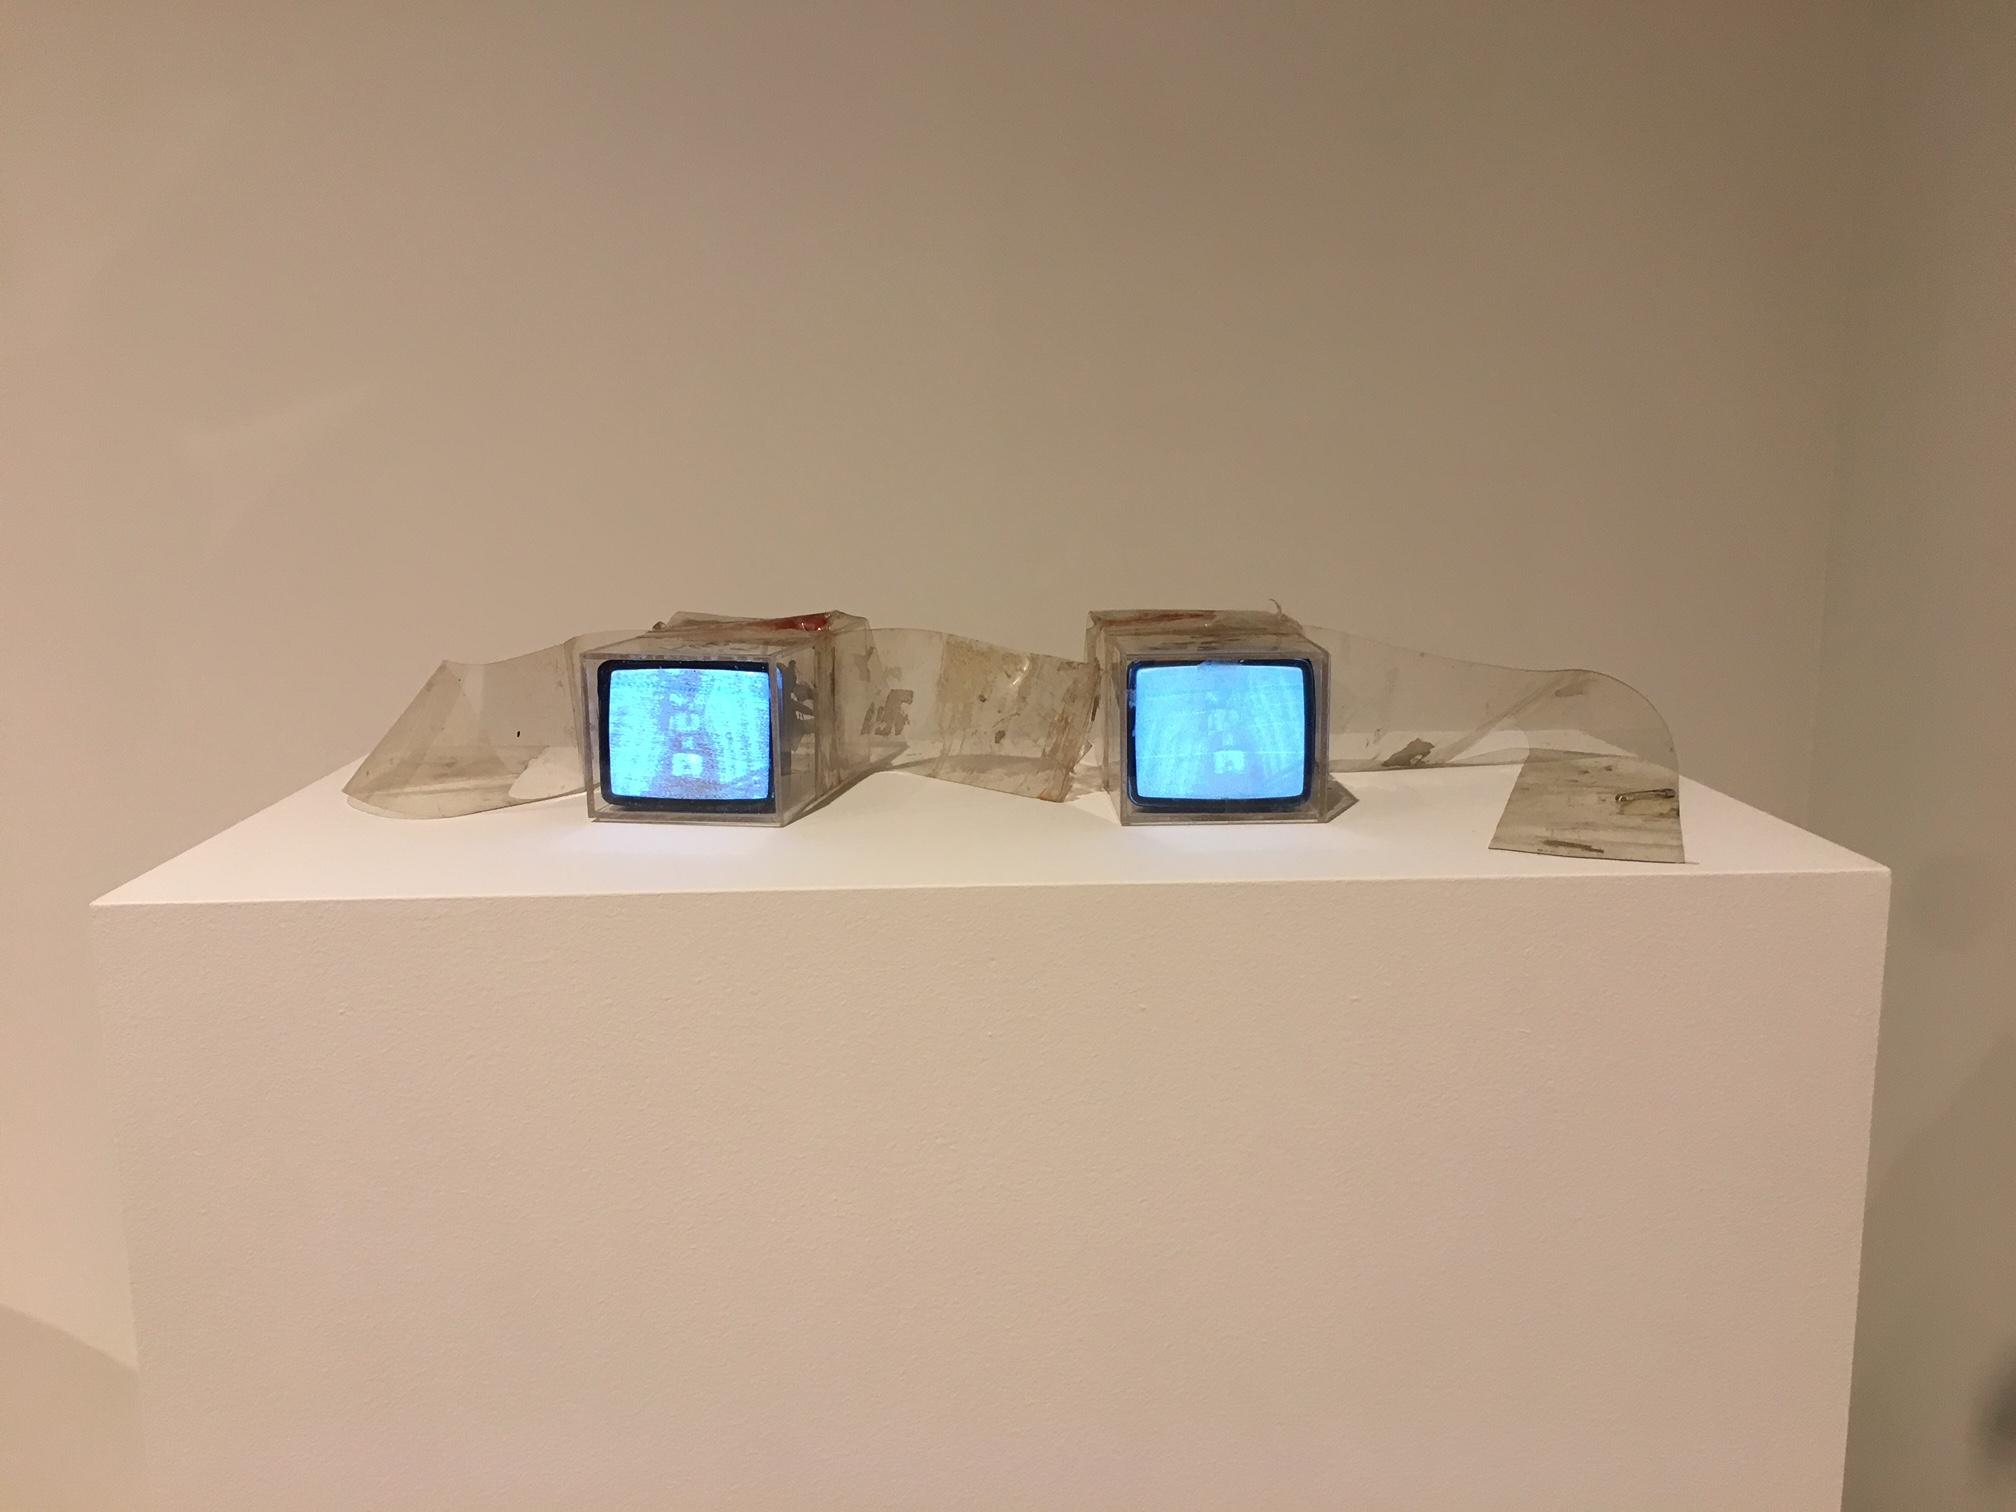 TV Bra for Living Sculpture, 1969, Nam June Paik (American, born Korea, 1932-2006), video tubes, television sets, rheostat, foot switches, Plexiglas boxes, vinyl straps, cables, and copper wire. Collection Walker Art Center, Minneapolis, T.B. Walker Acquisition Fund, 1991.